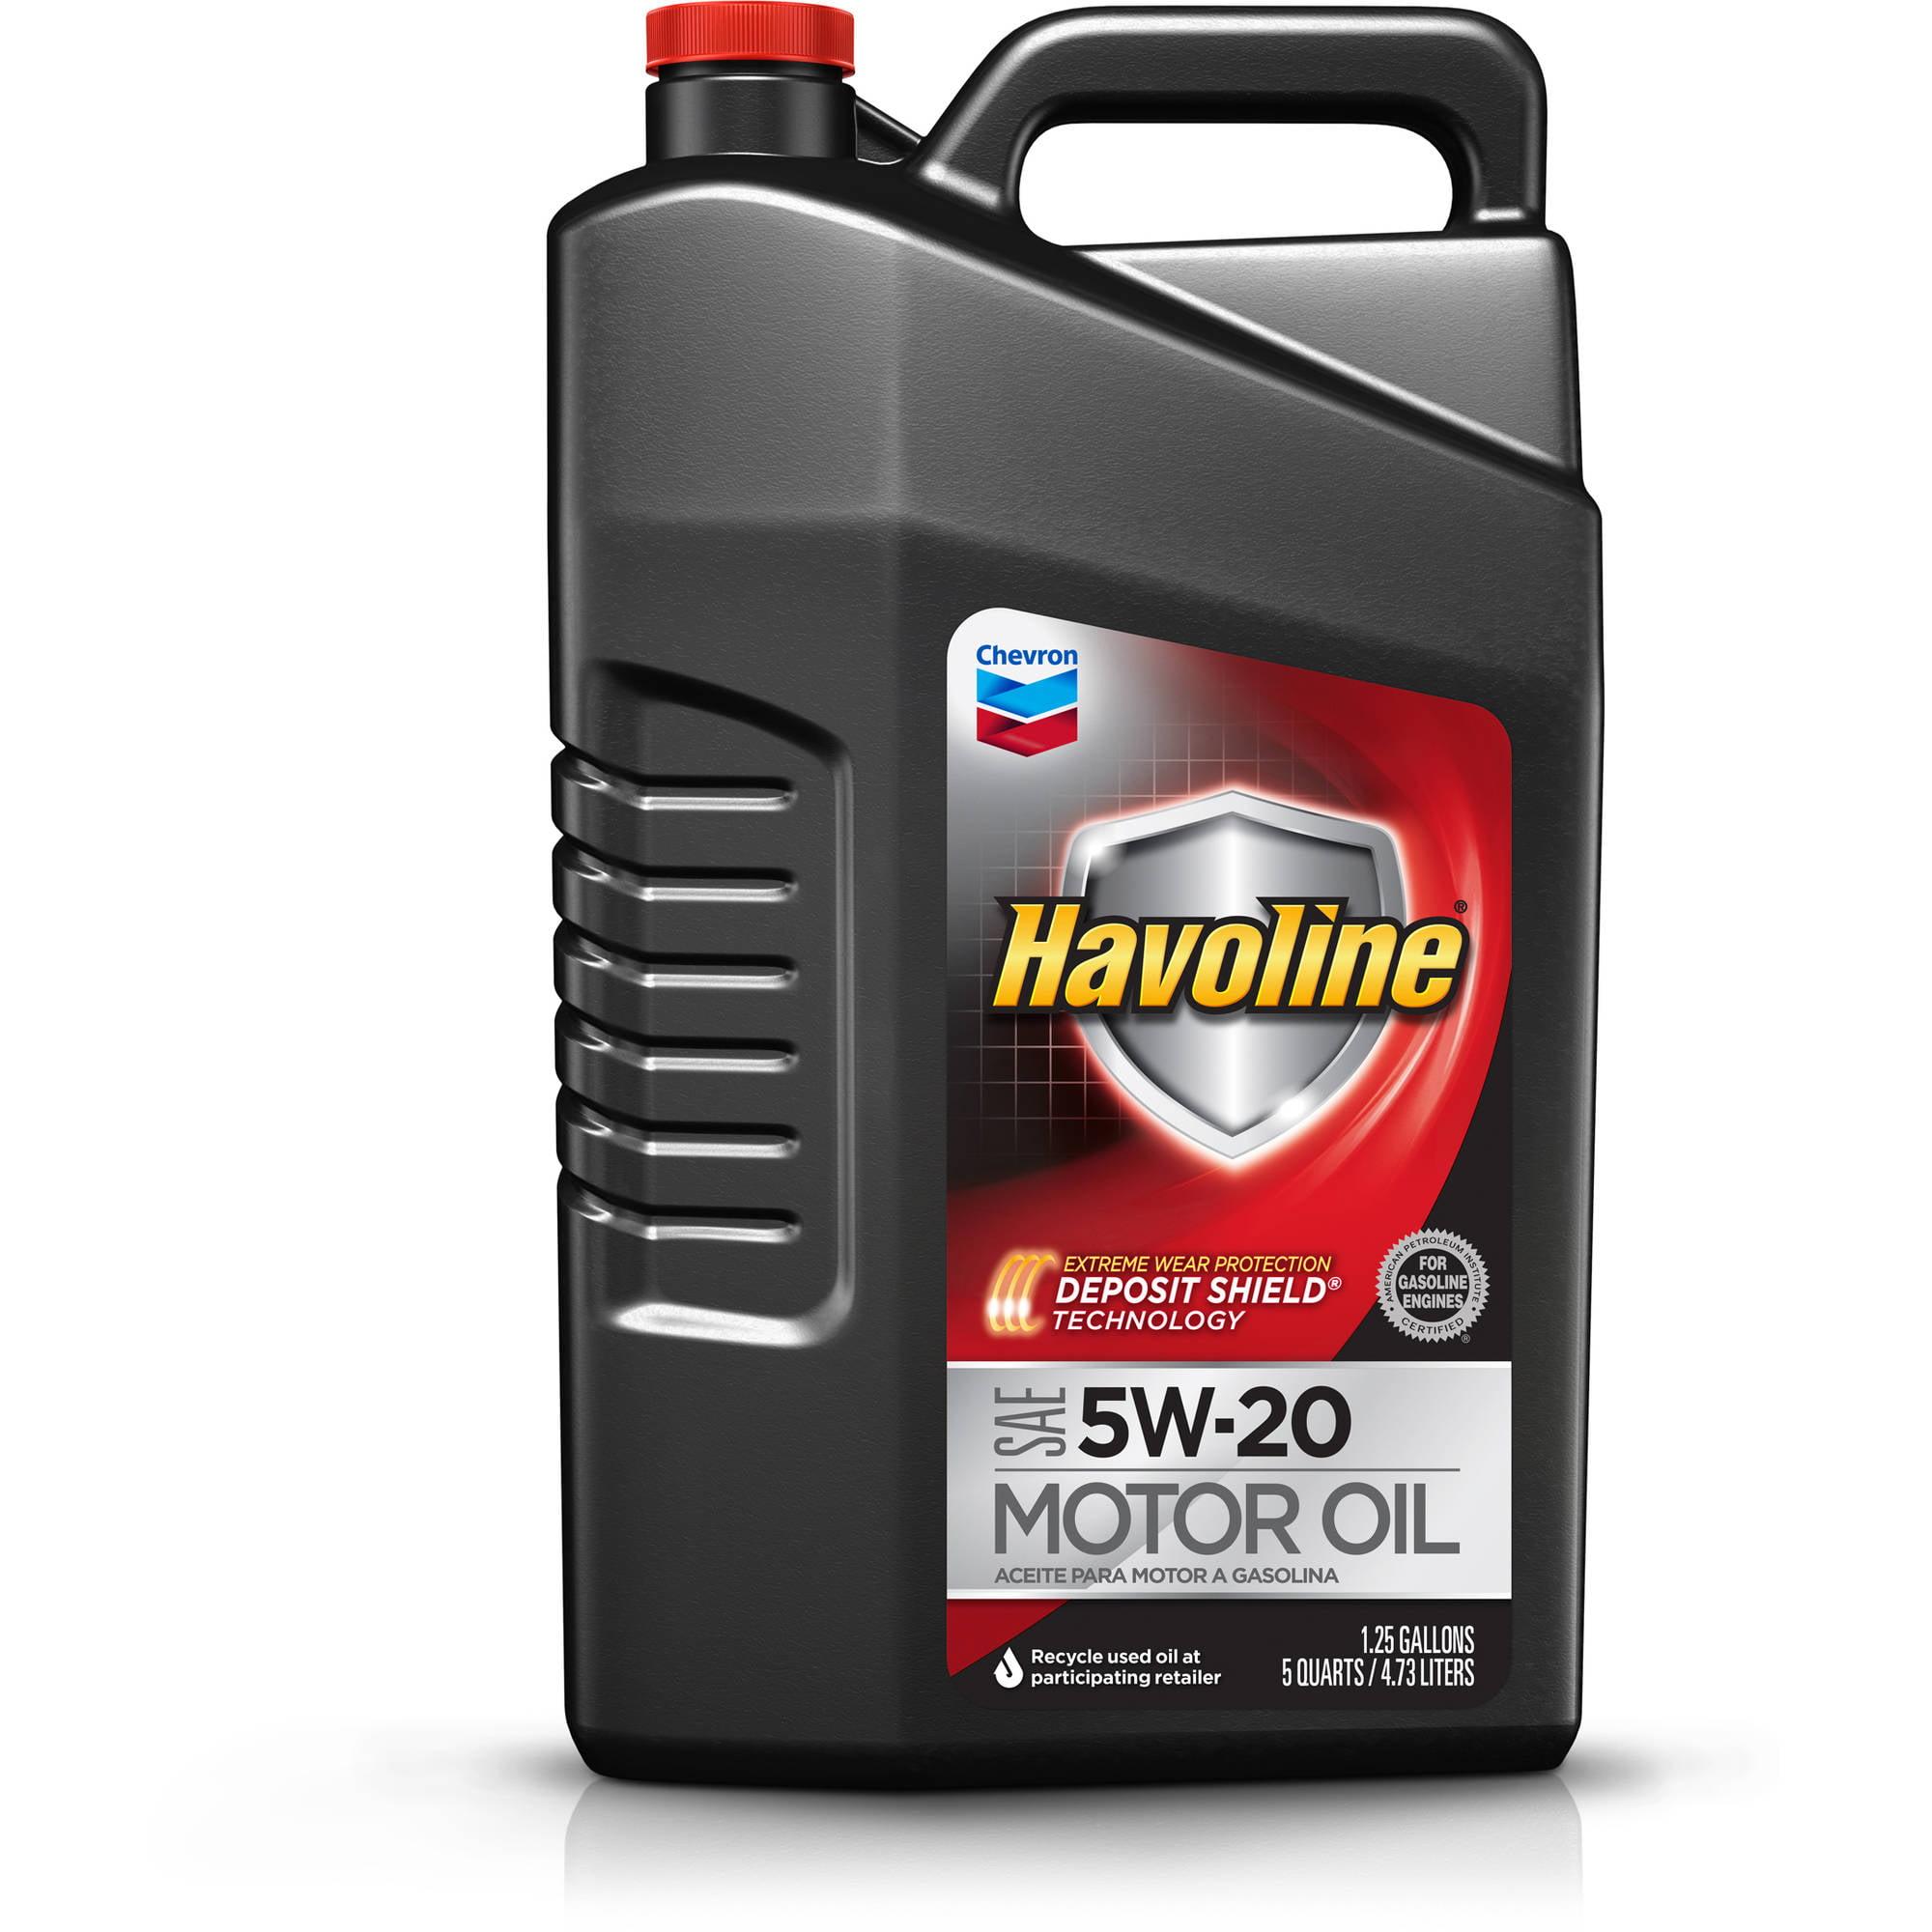 Havoline Motor Oil 5W20, 5 qt